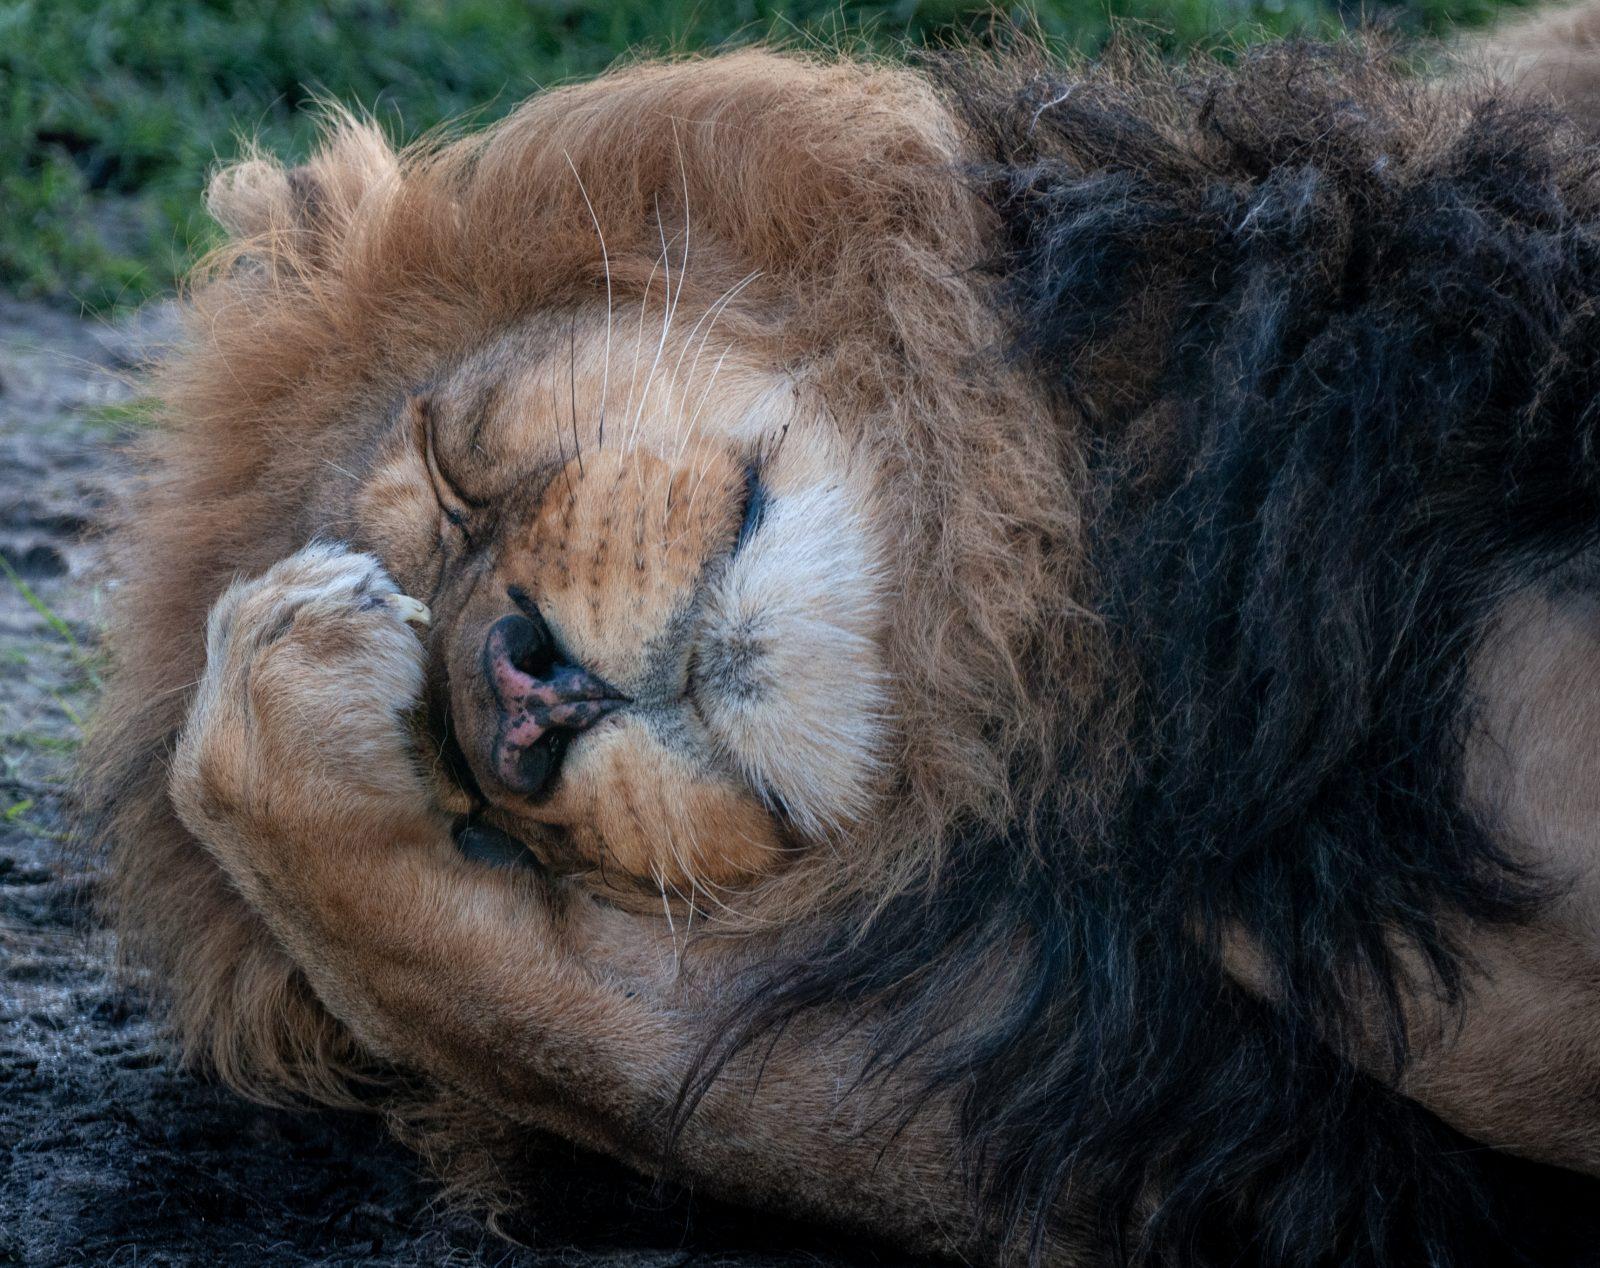 lion thinking doh emotion hand on head